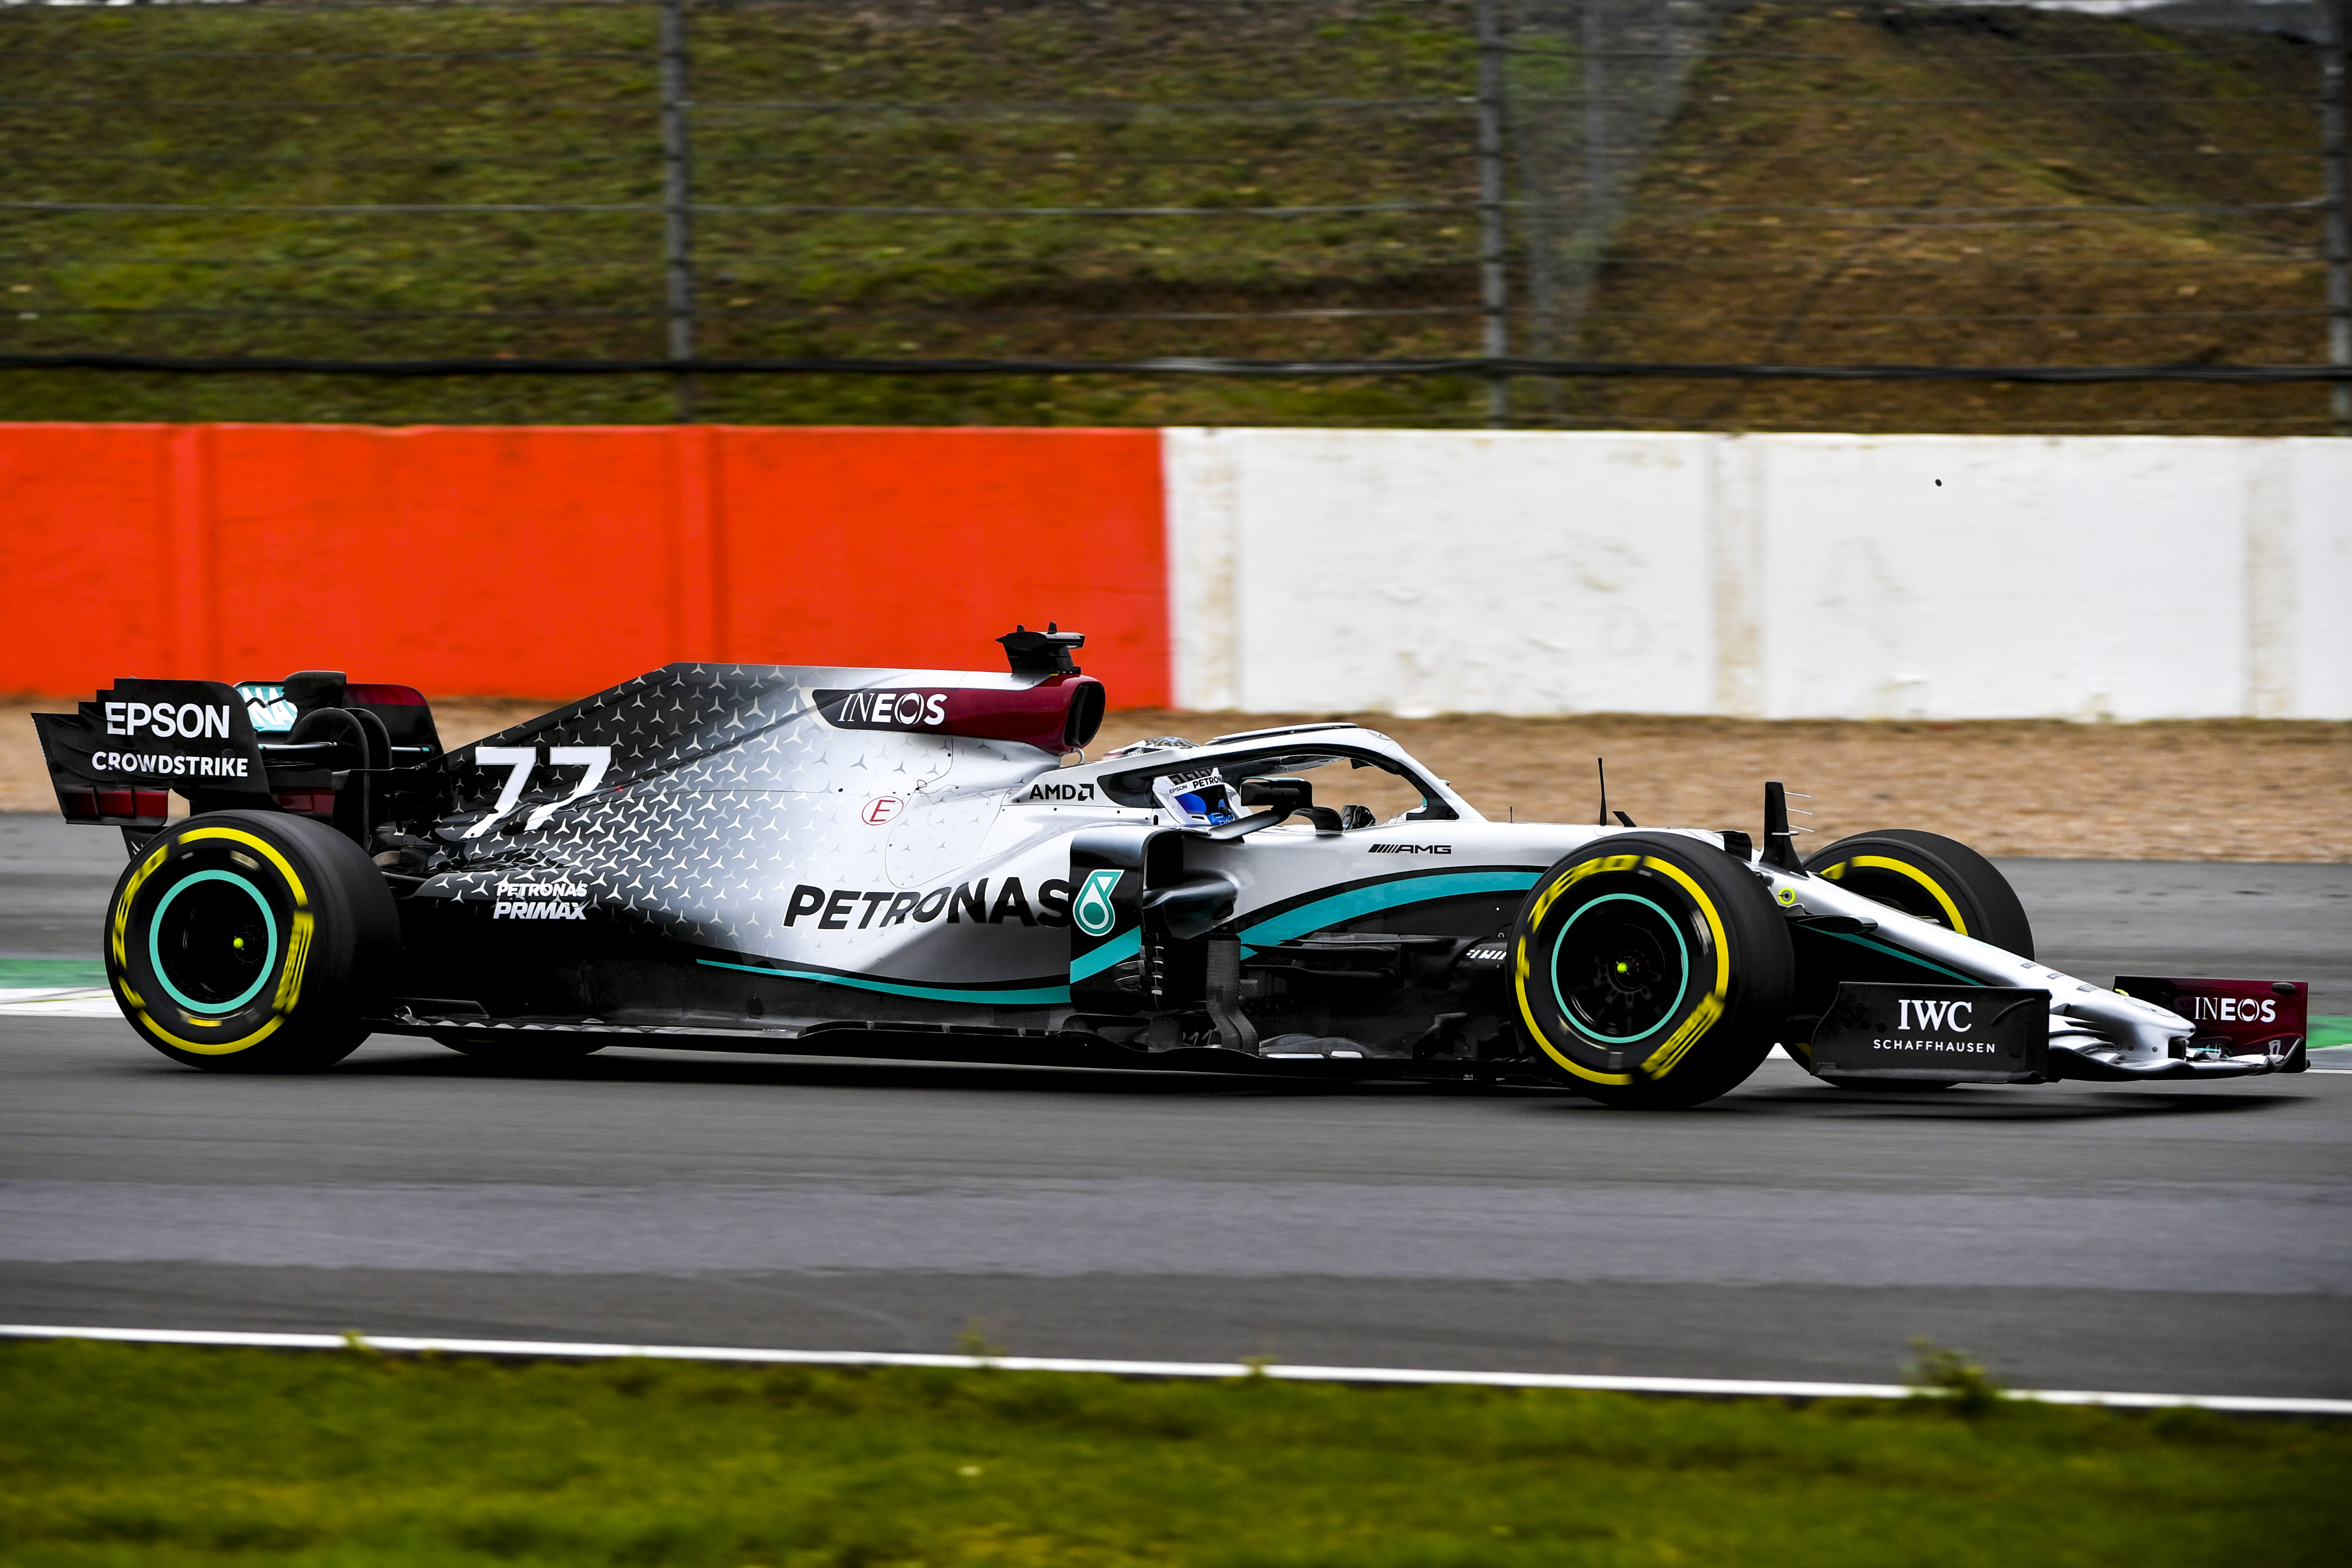 F1 Formula 1 Mercedes W11 Lewis Hamilton